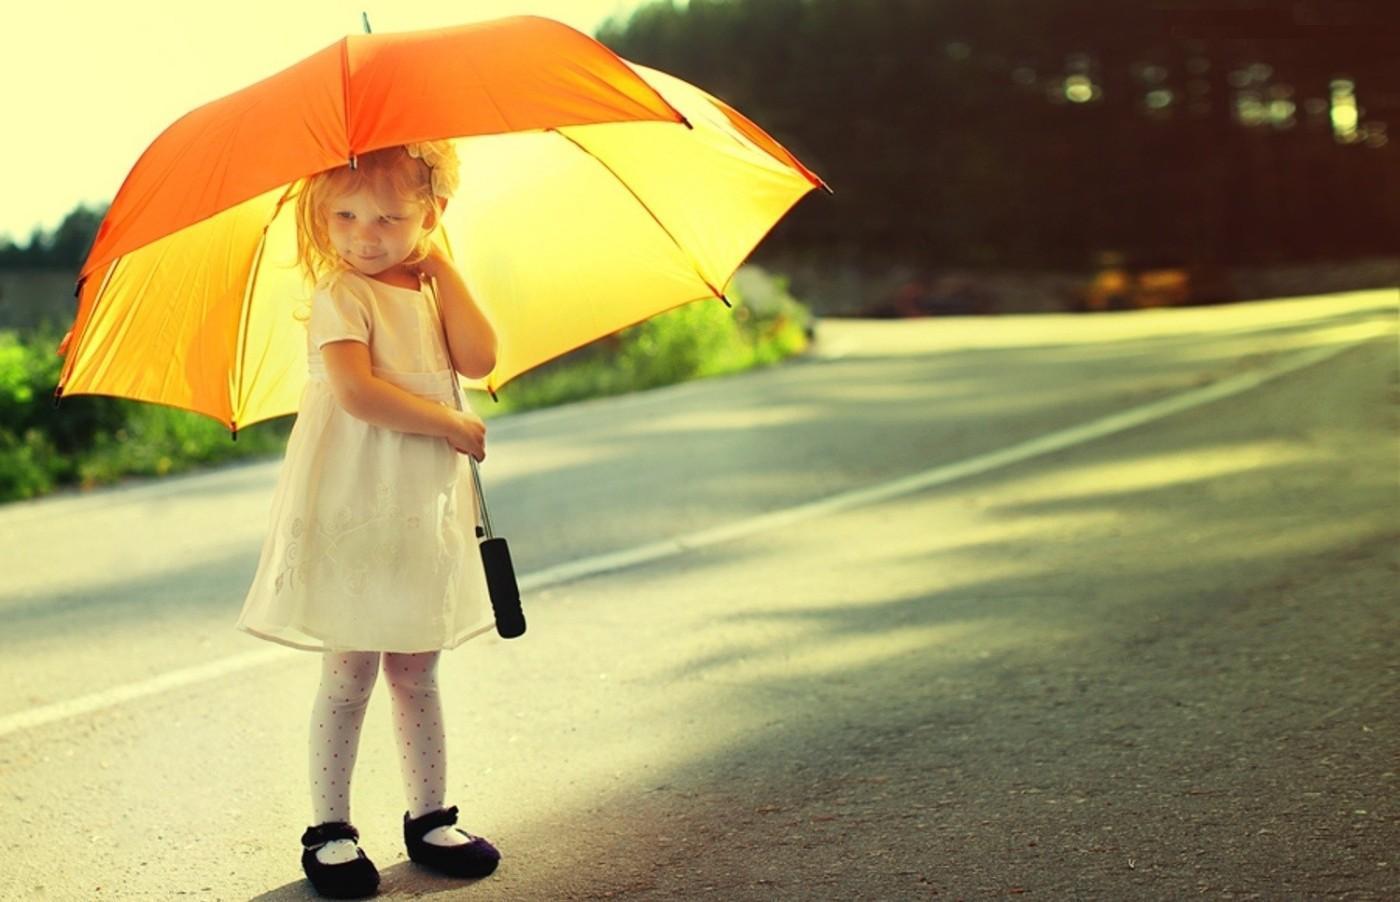 Cute Umbrella Girl Wallpapers - 1400x902 - 106392